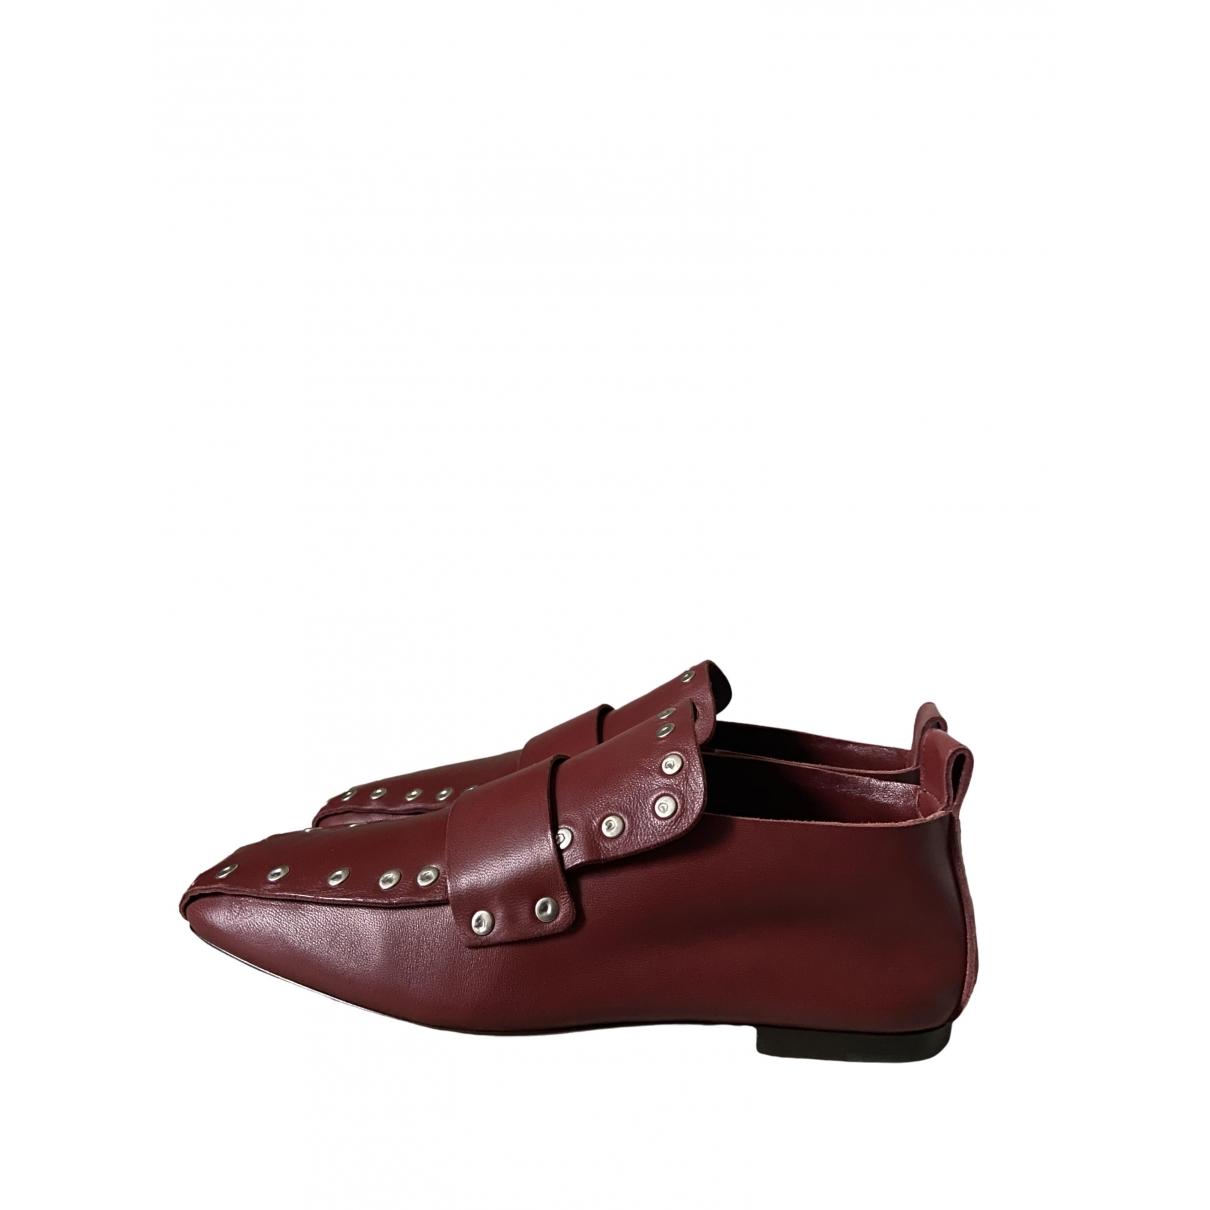 Celine \N Burgundy Leather Flats for Women 37 EU